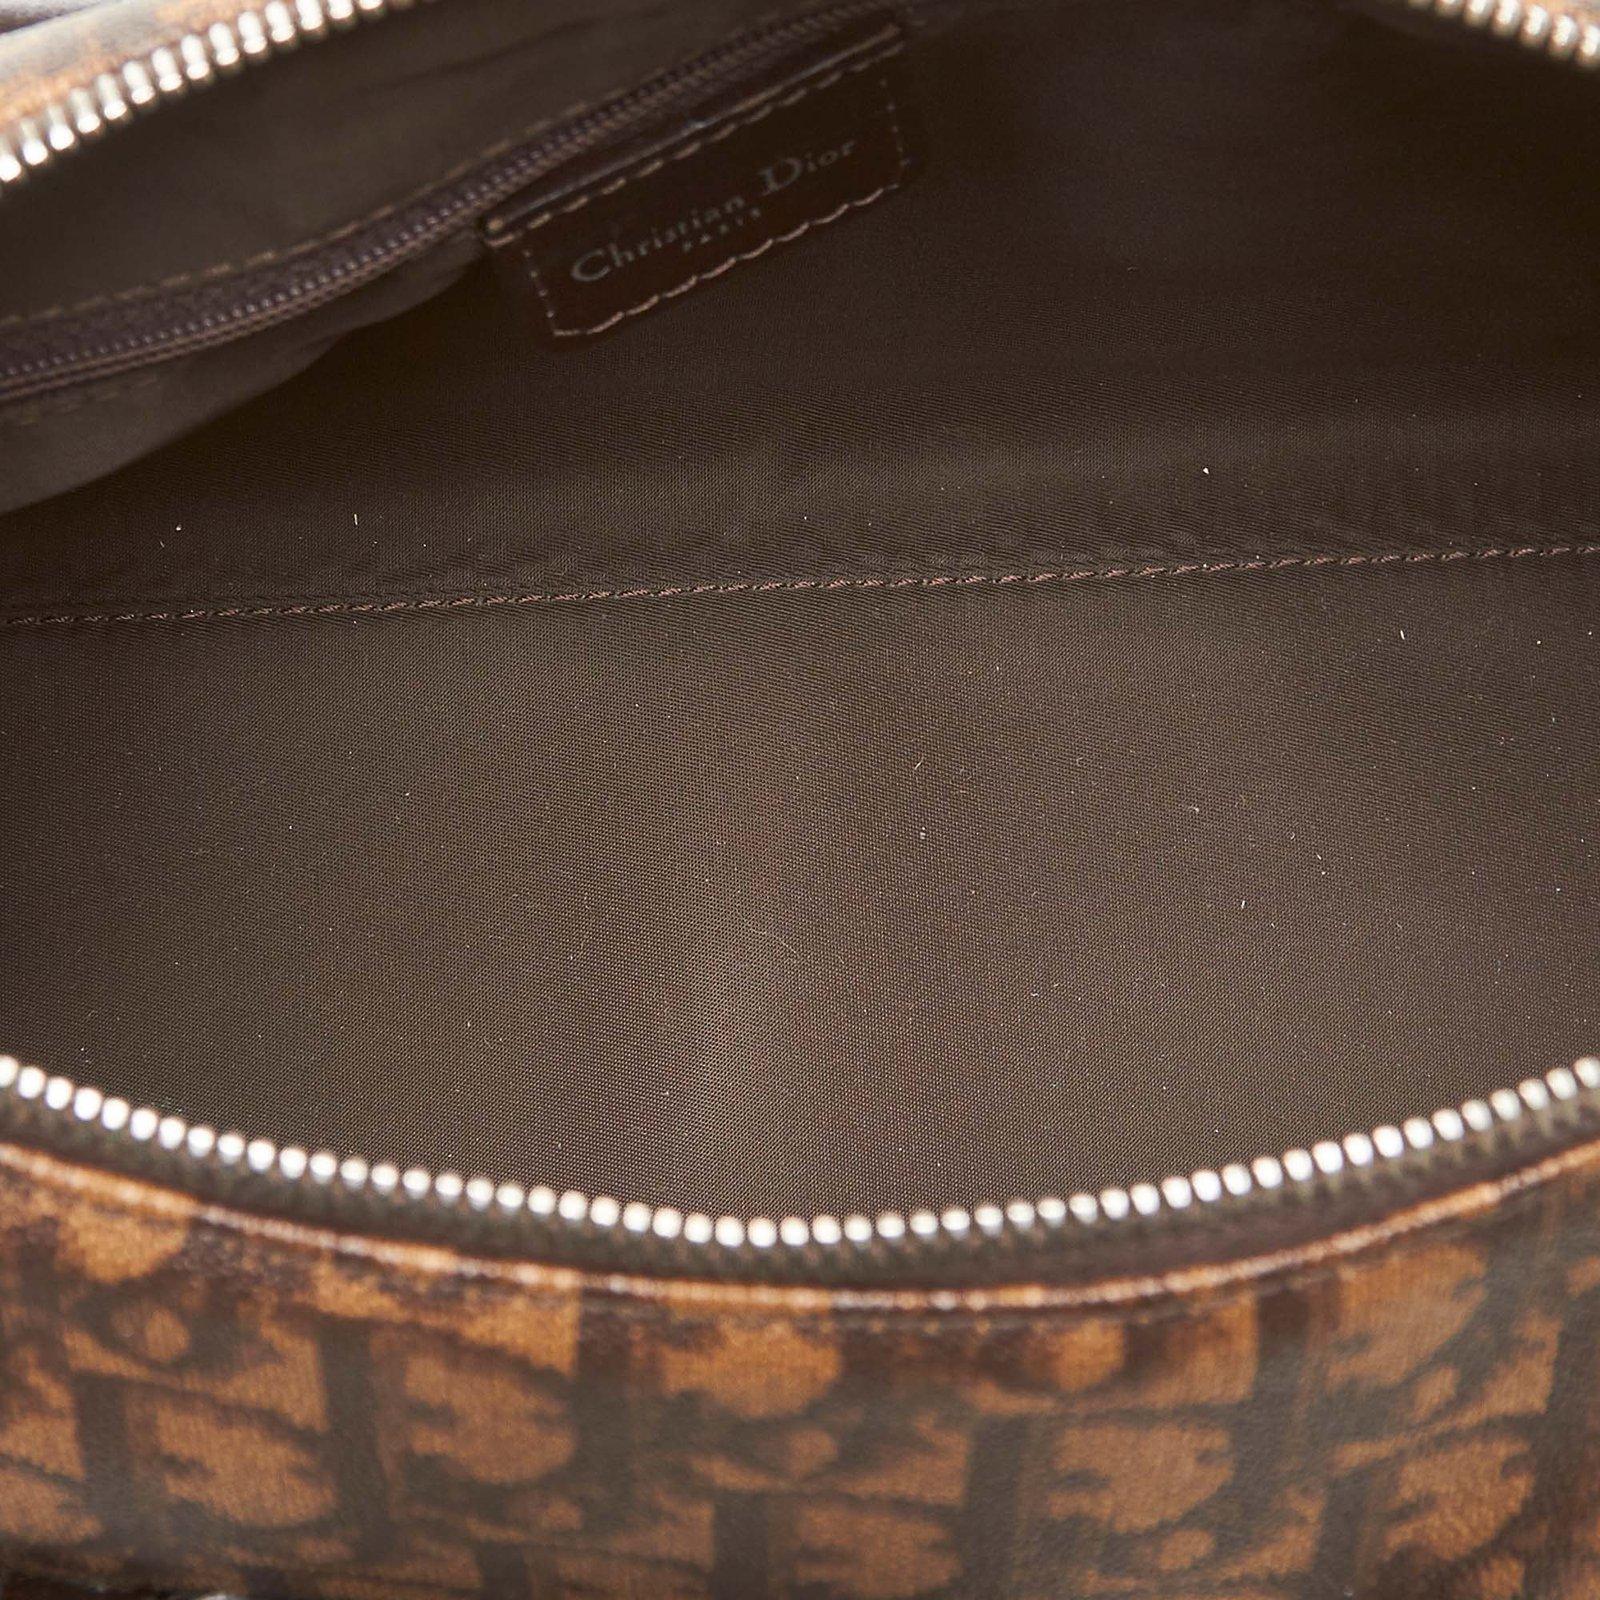 f02c95d59cbe Dior Oblique Romantique Handbag Handbags Leather